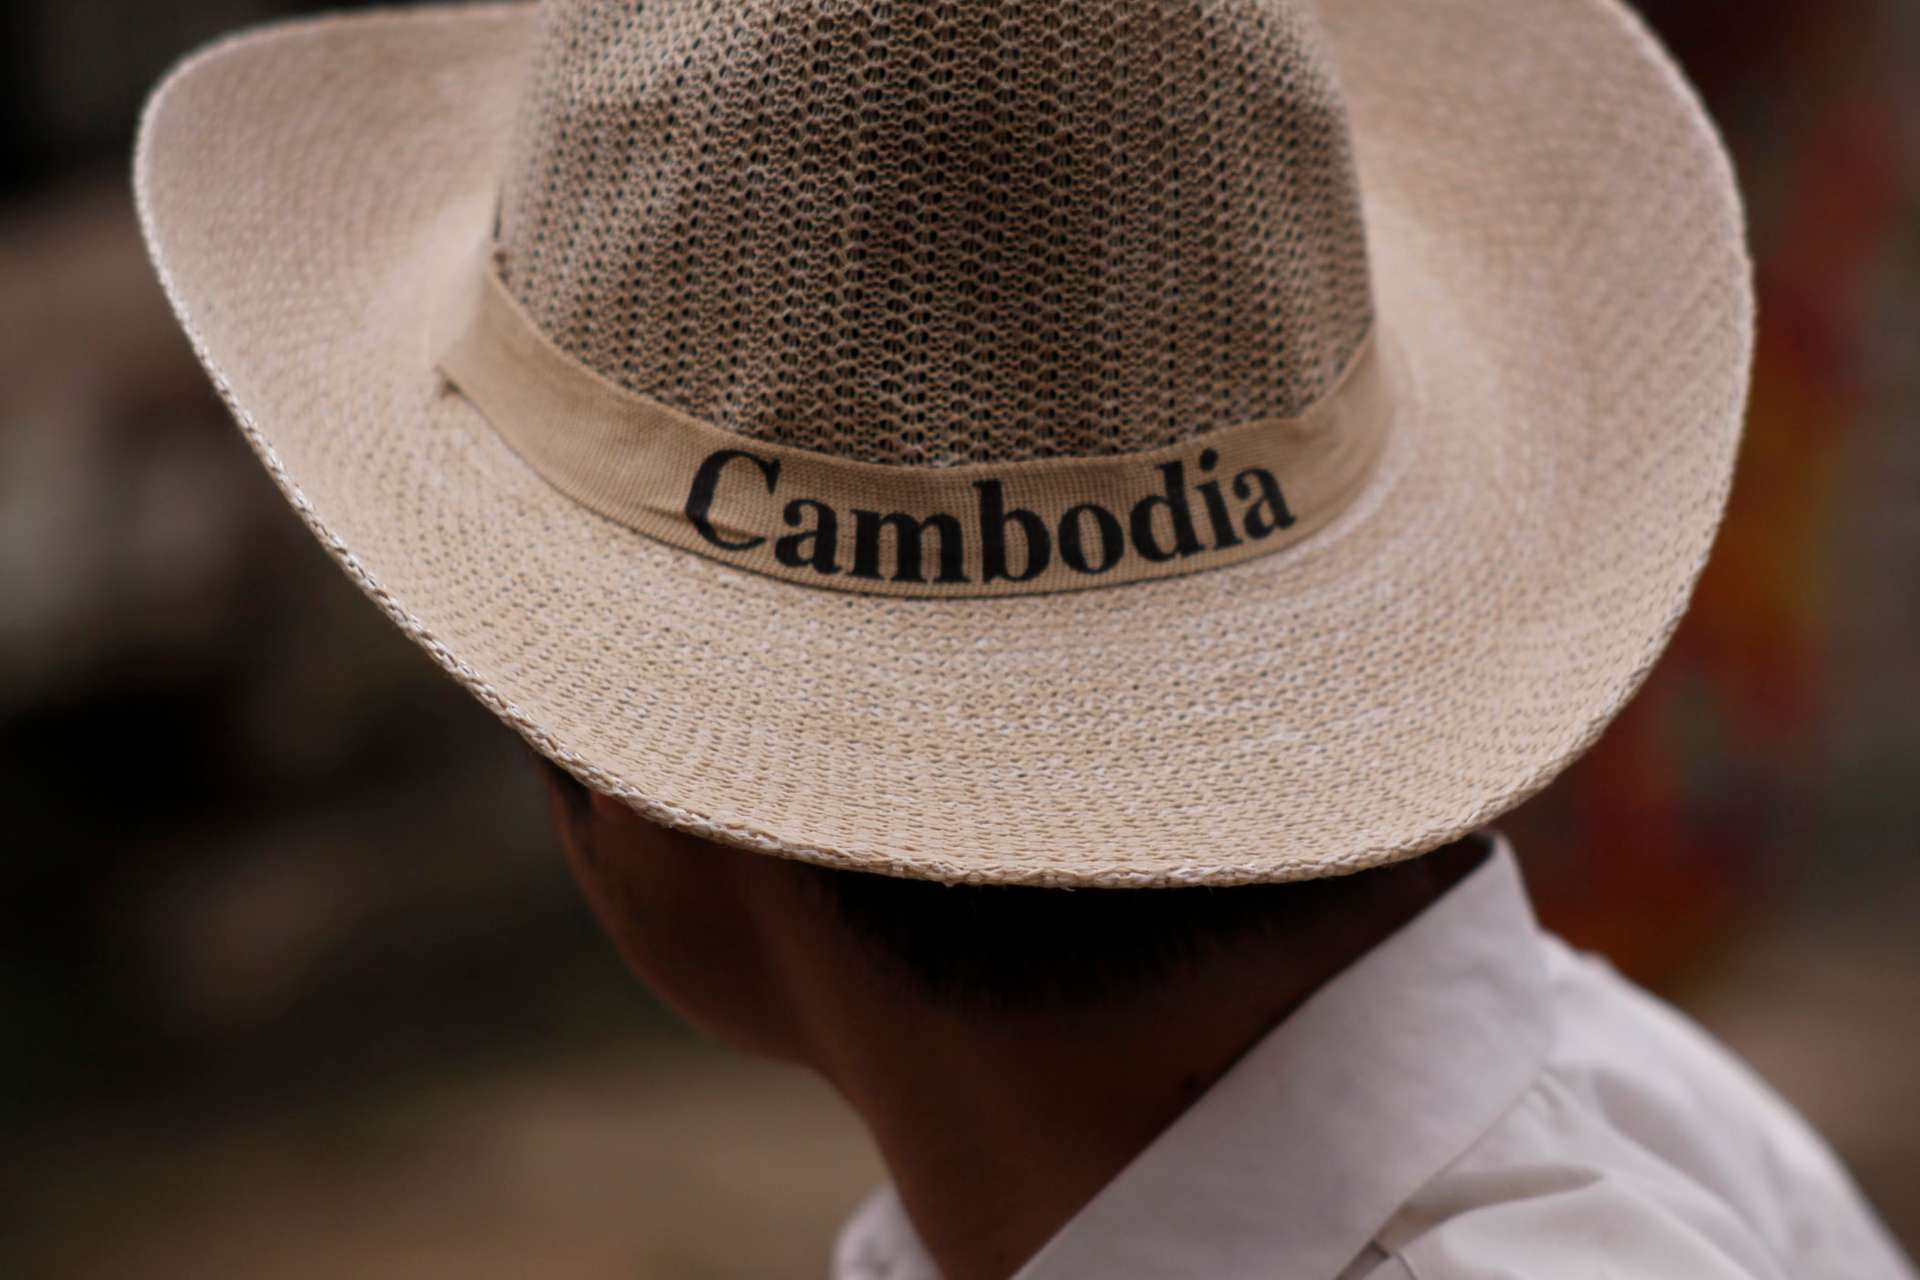 Cambodia Hat, Cambodja